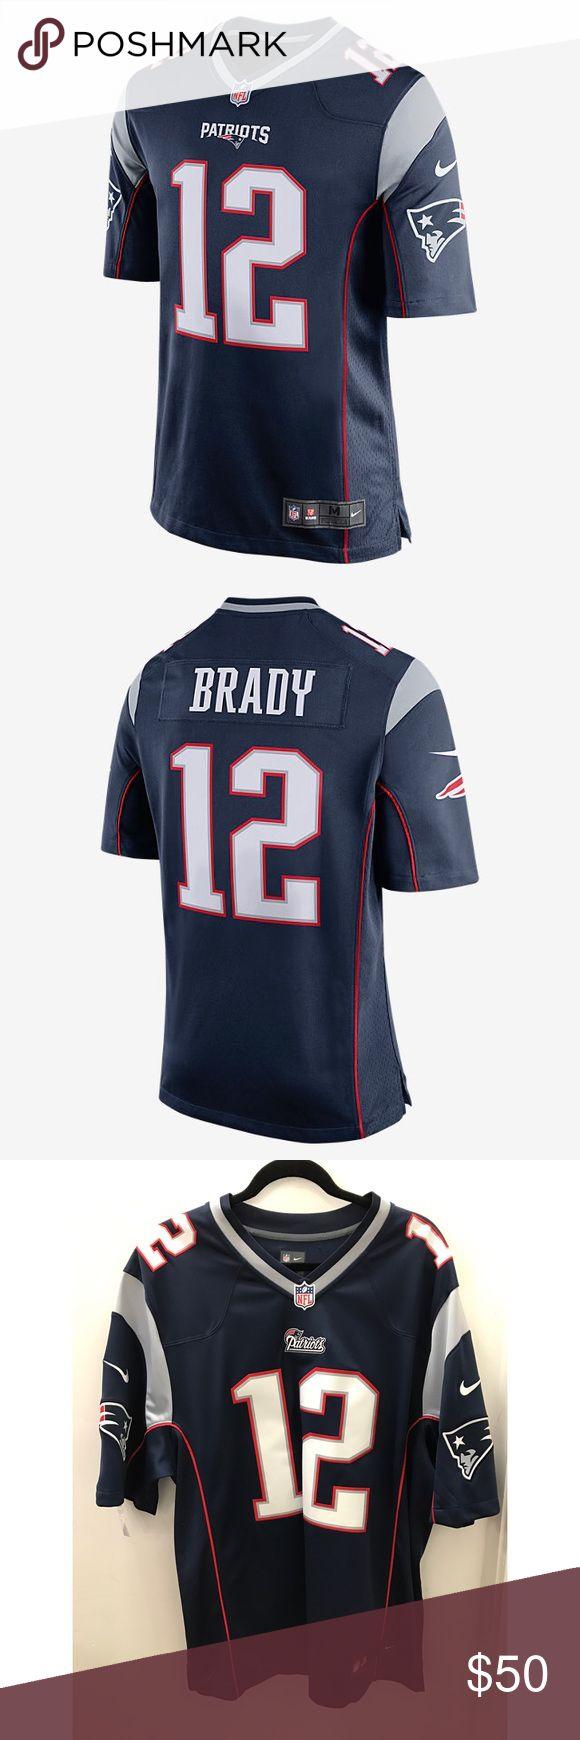 NFL NEW ENGLAND PATRIOTS GAME JERSEY (TOM BRADY) College Navy/Wolf Grey/University Red NFL Shirts